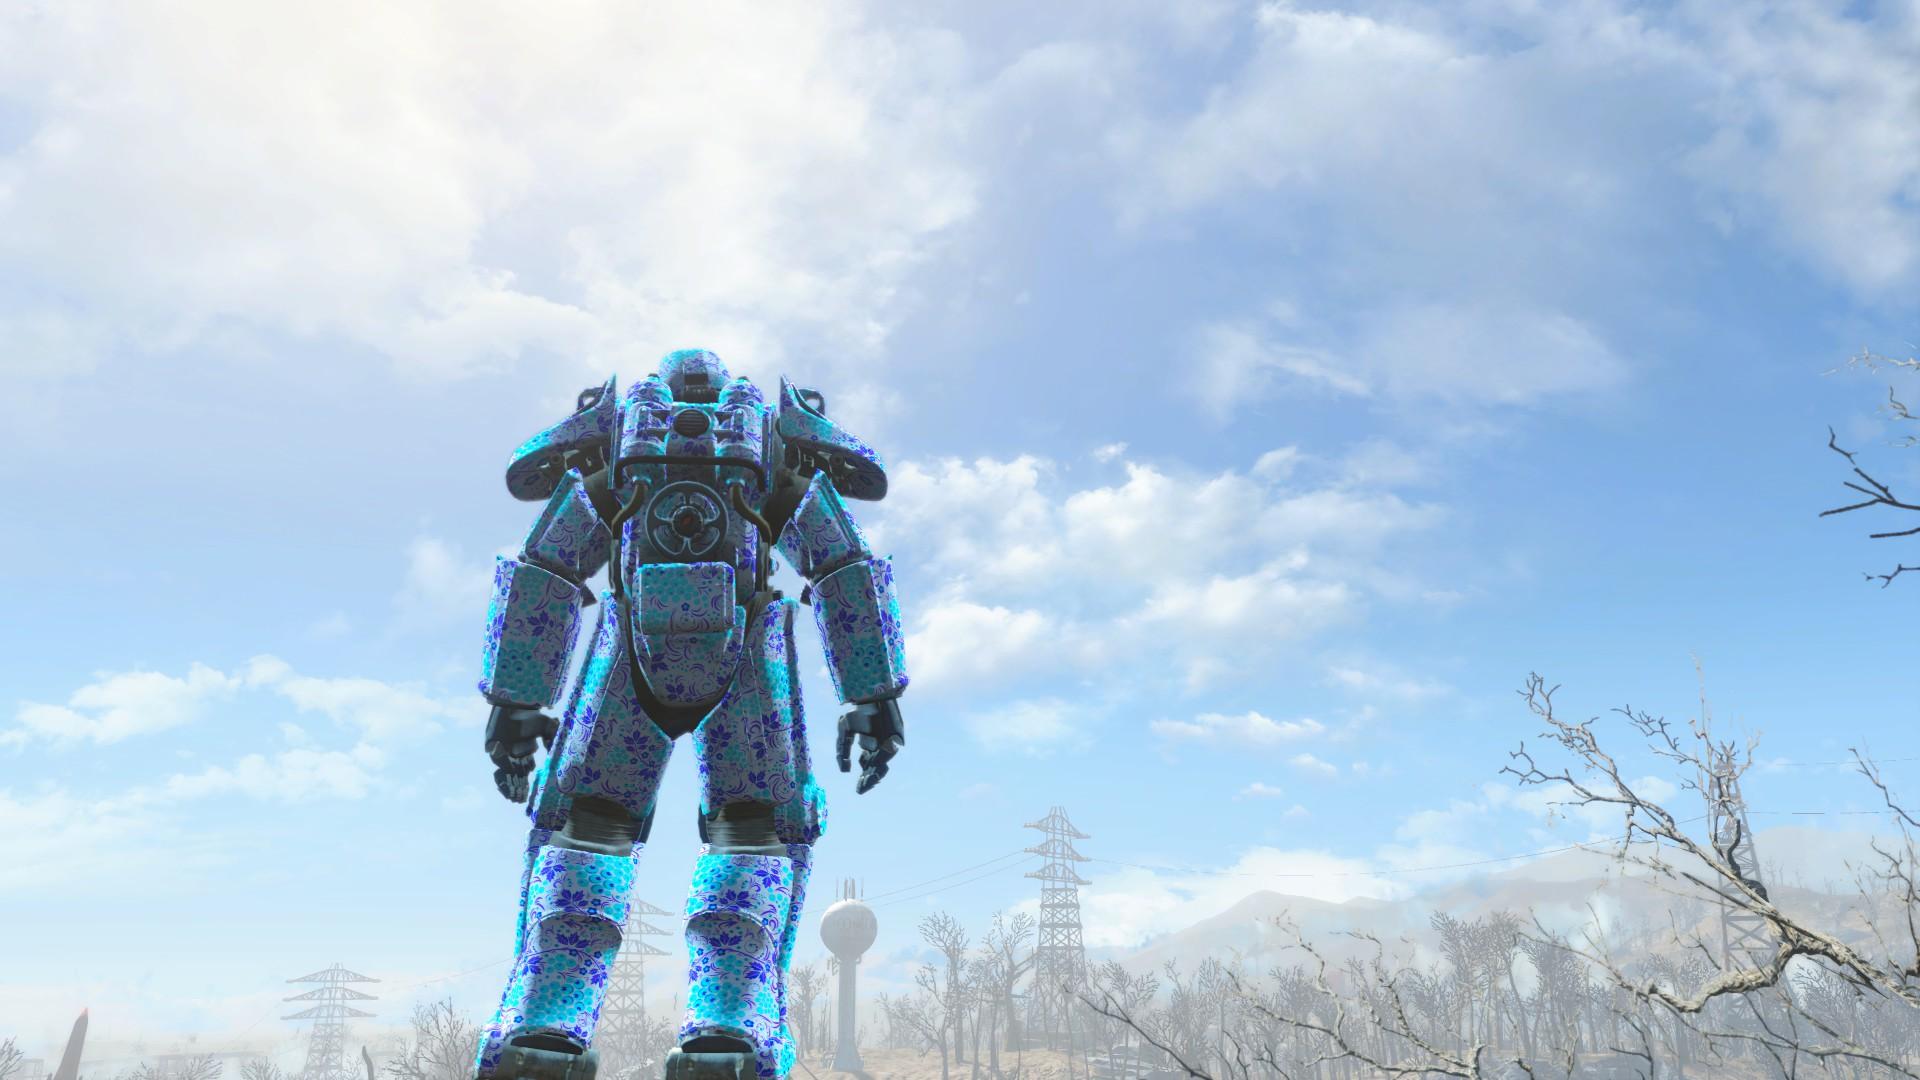 20190406152643_1.jpg - Fallout 4